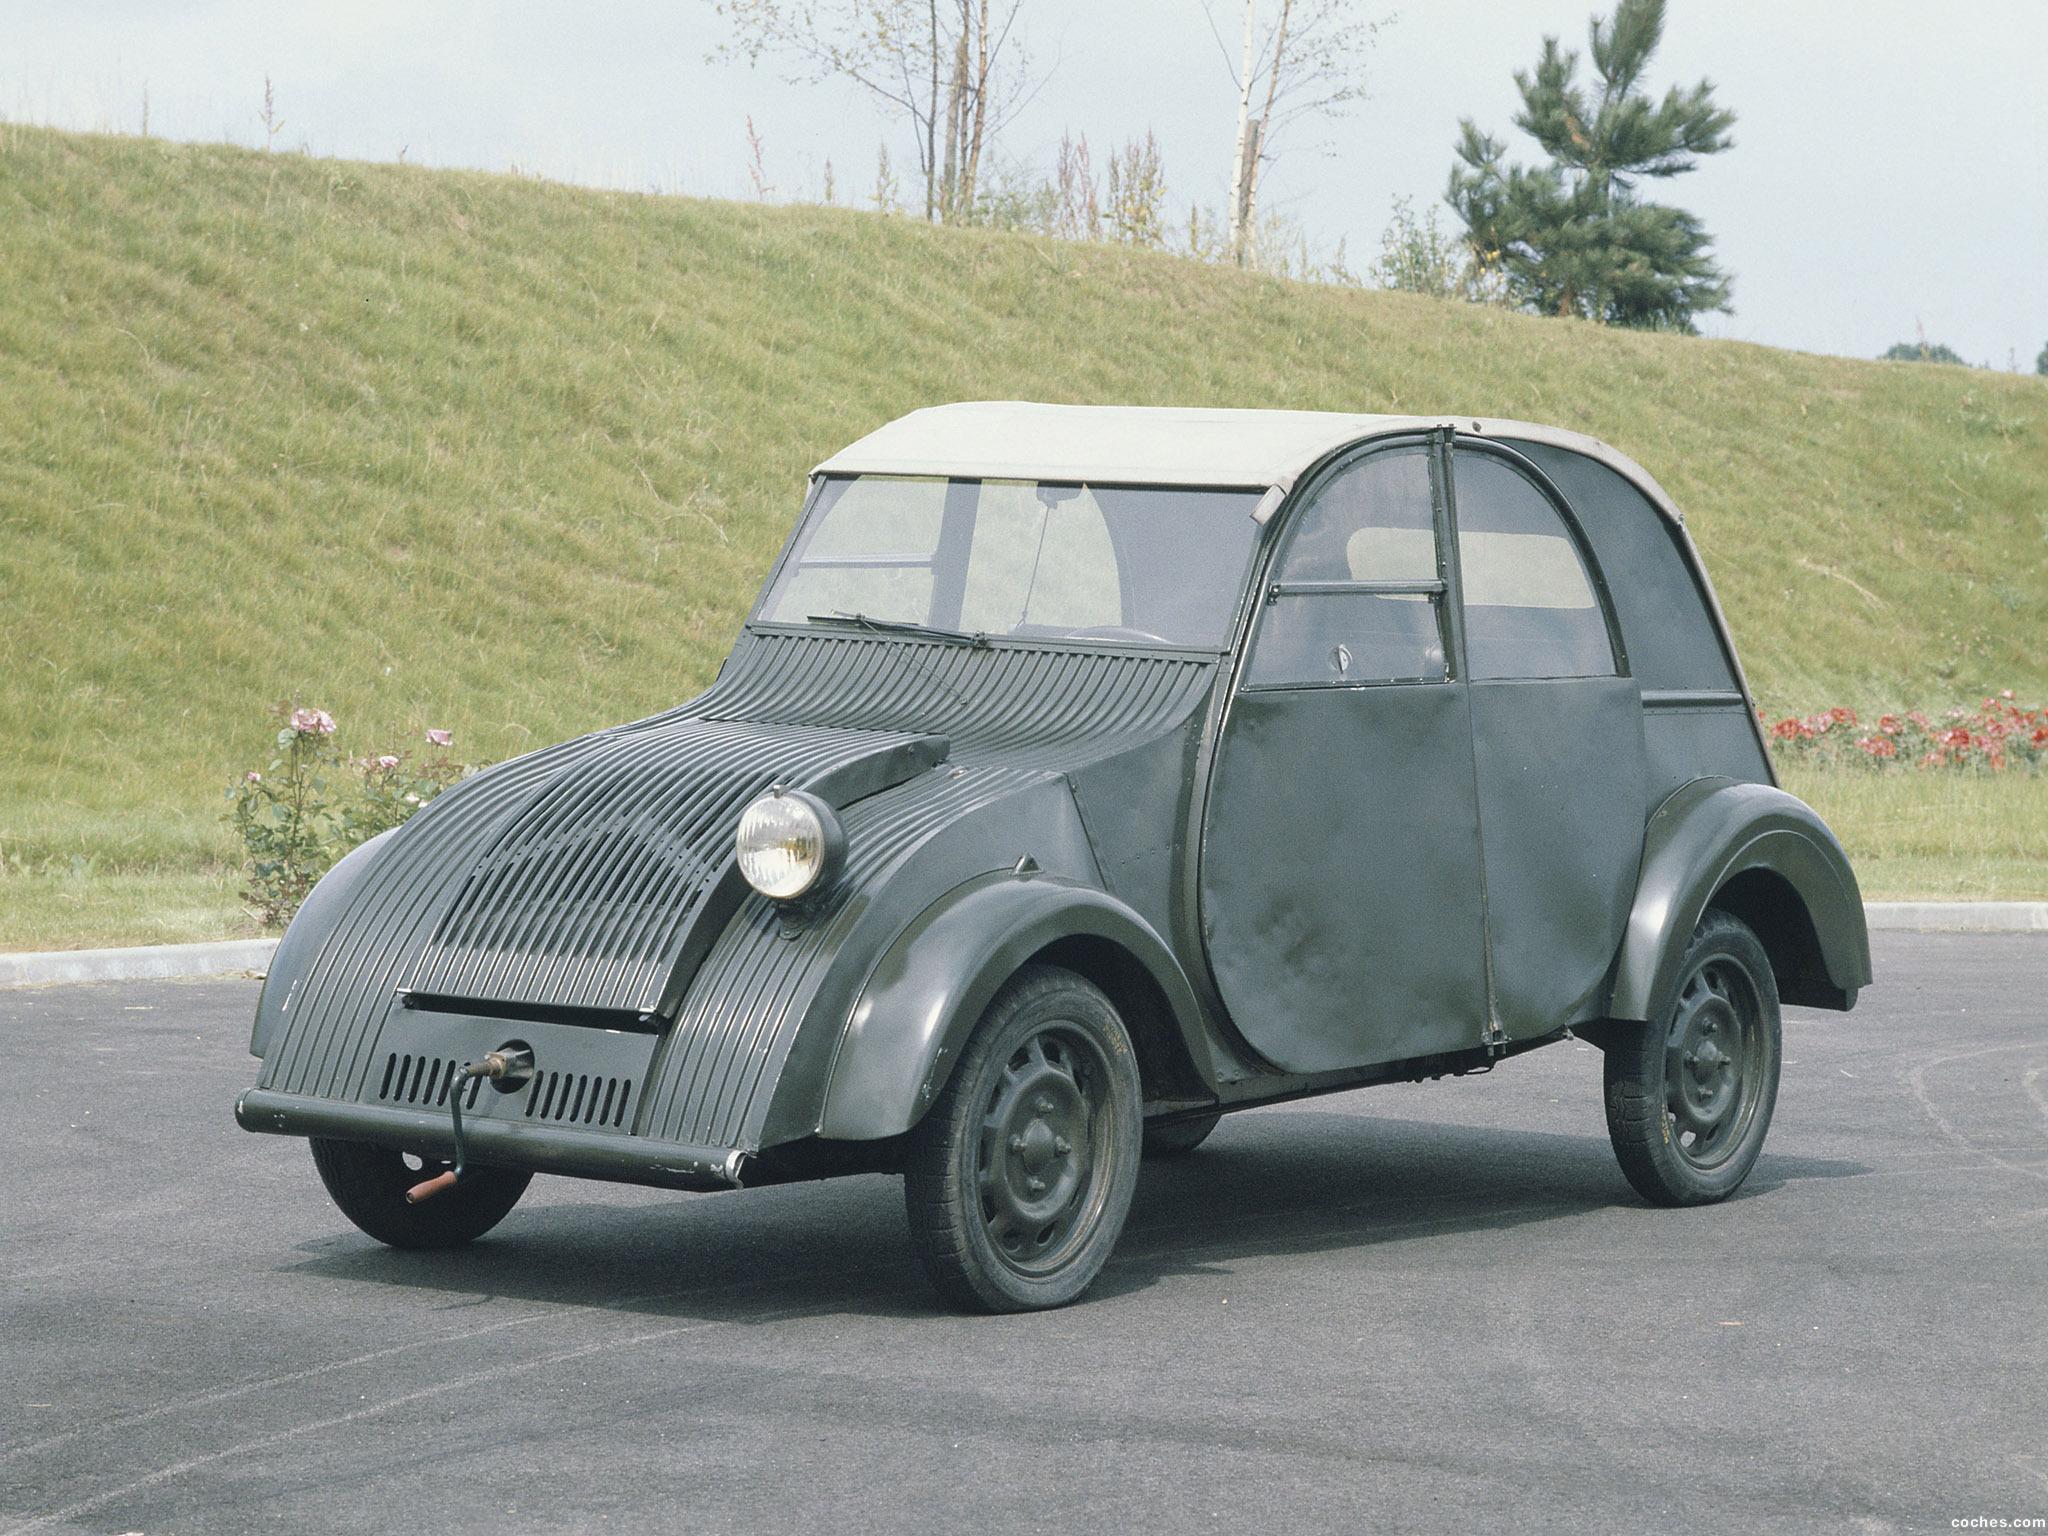 citroen 2cv prototype 1941 r2 Citroen 2CV Prototype 1941